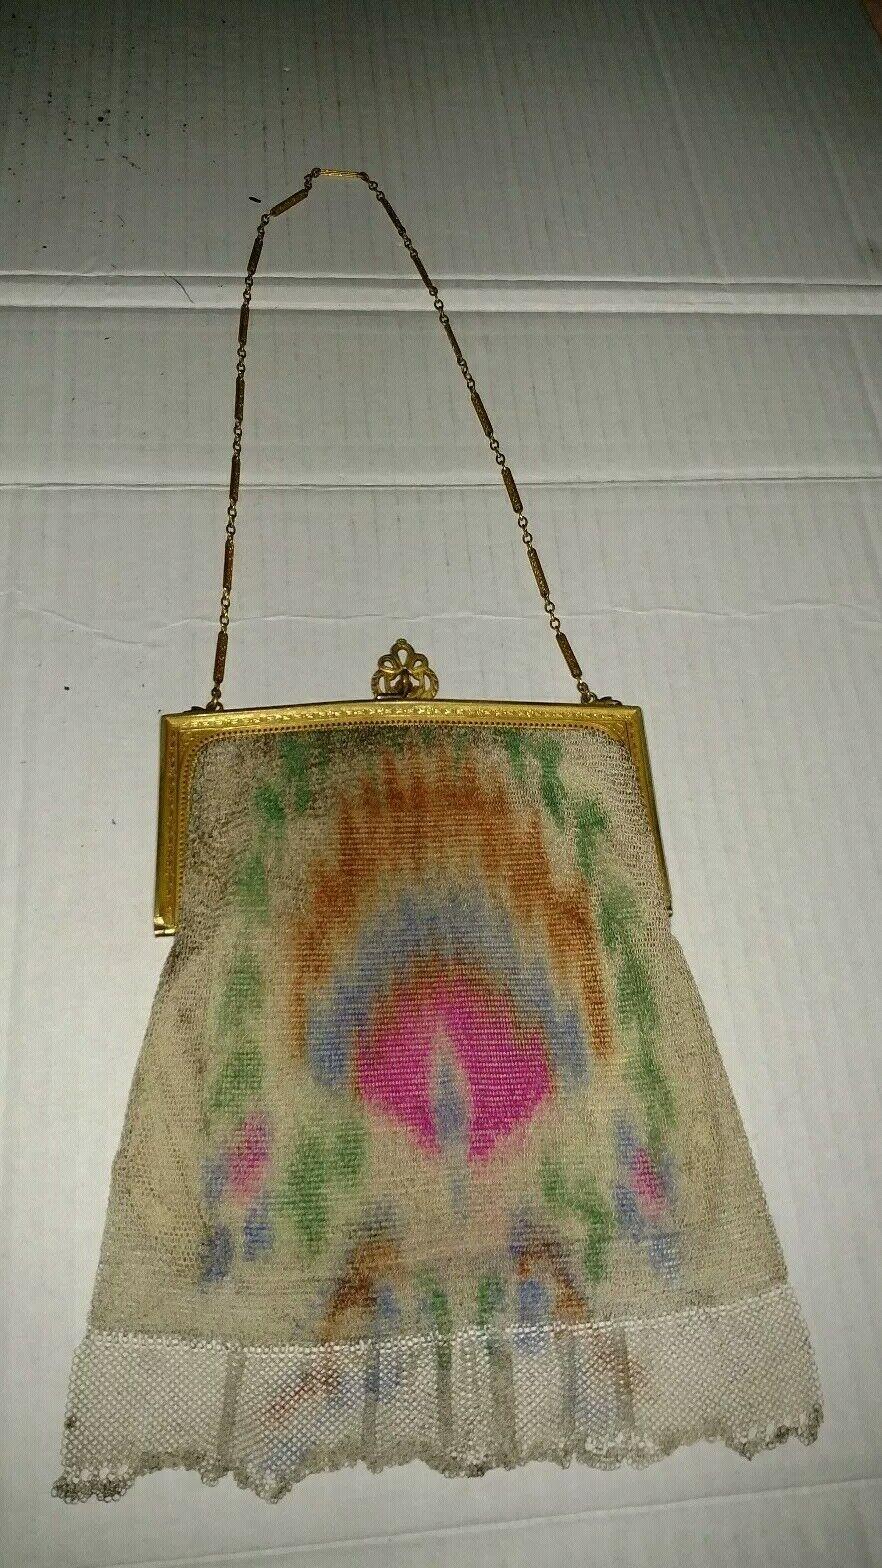 Vintage Art Deco Yellow Purse  Whiting and Davis Enamel Beadlite  Antique Reticule Whiting and Davis Mesh Handbag